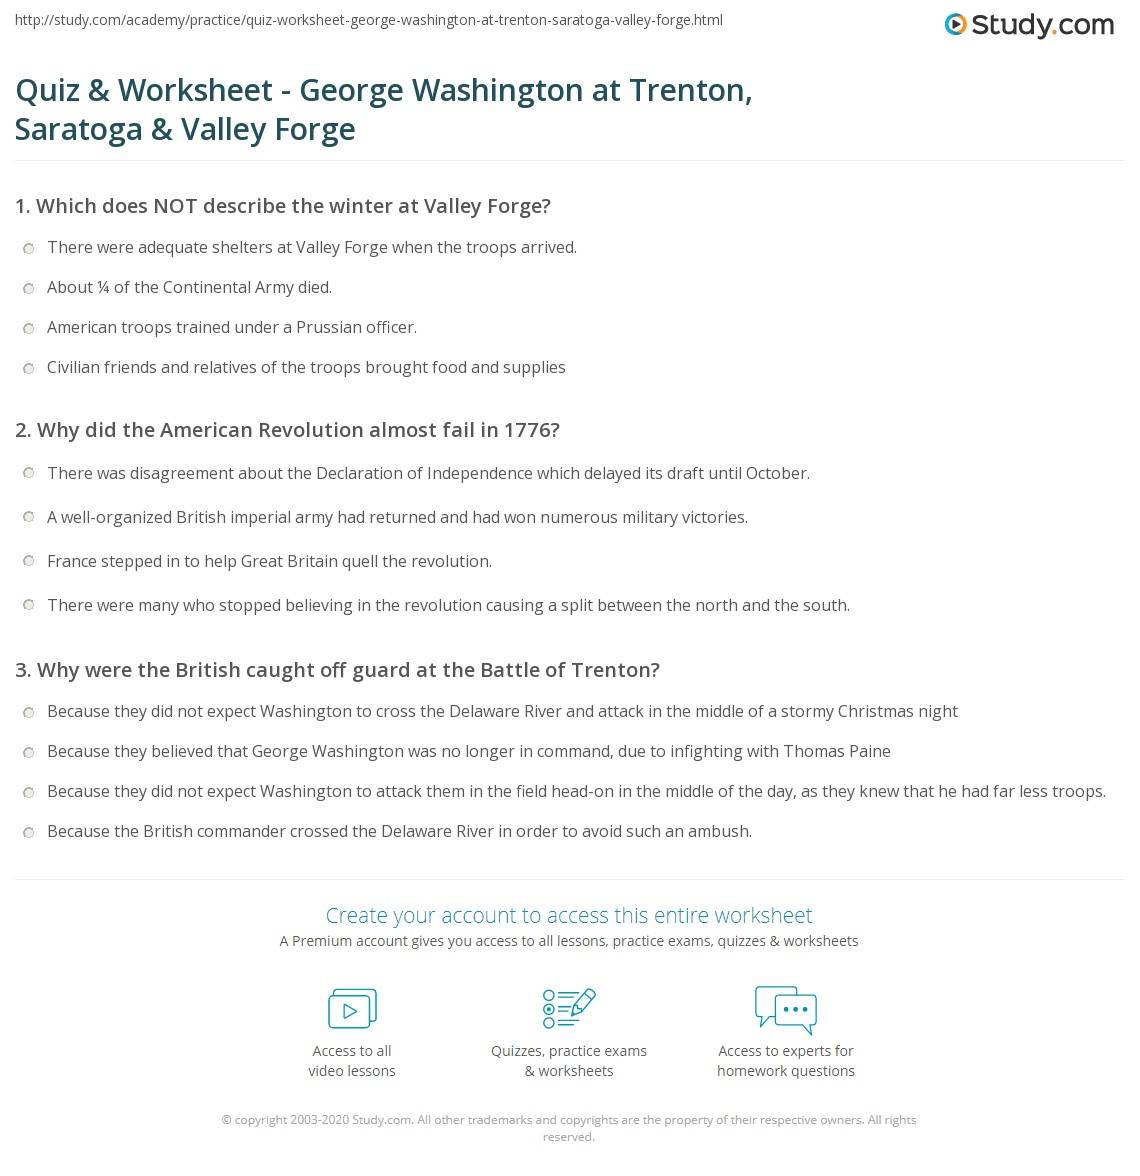 Free Worksheet George Washington Worksheets quiz worksheet george washington at trenton saratoga valley print washingtons leadership forge worksheet